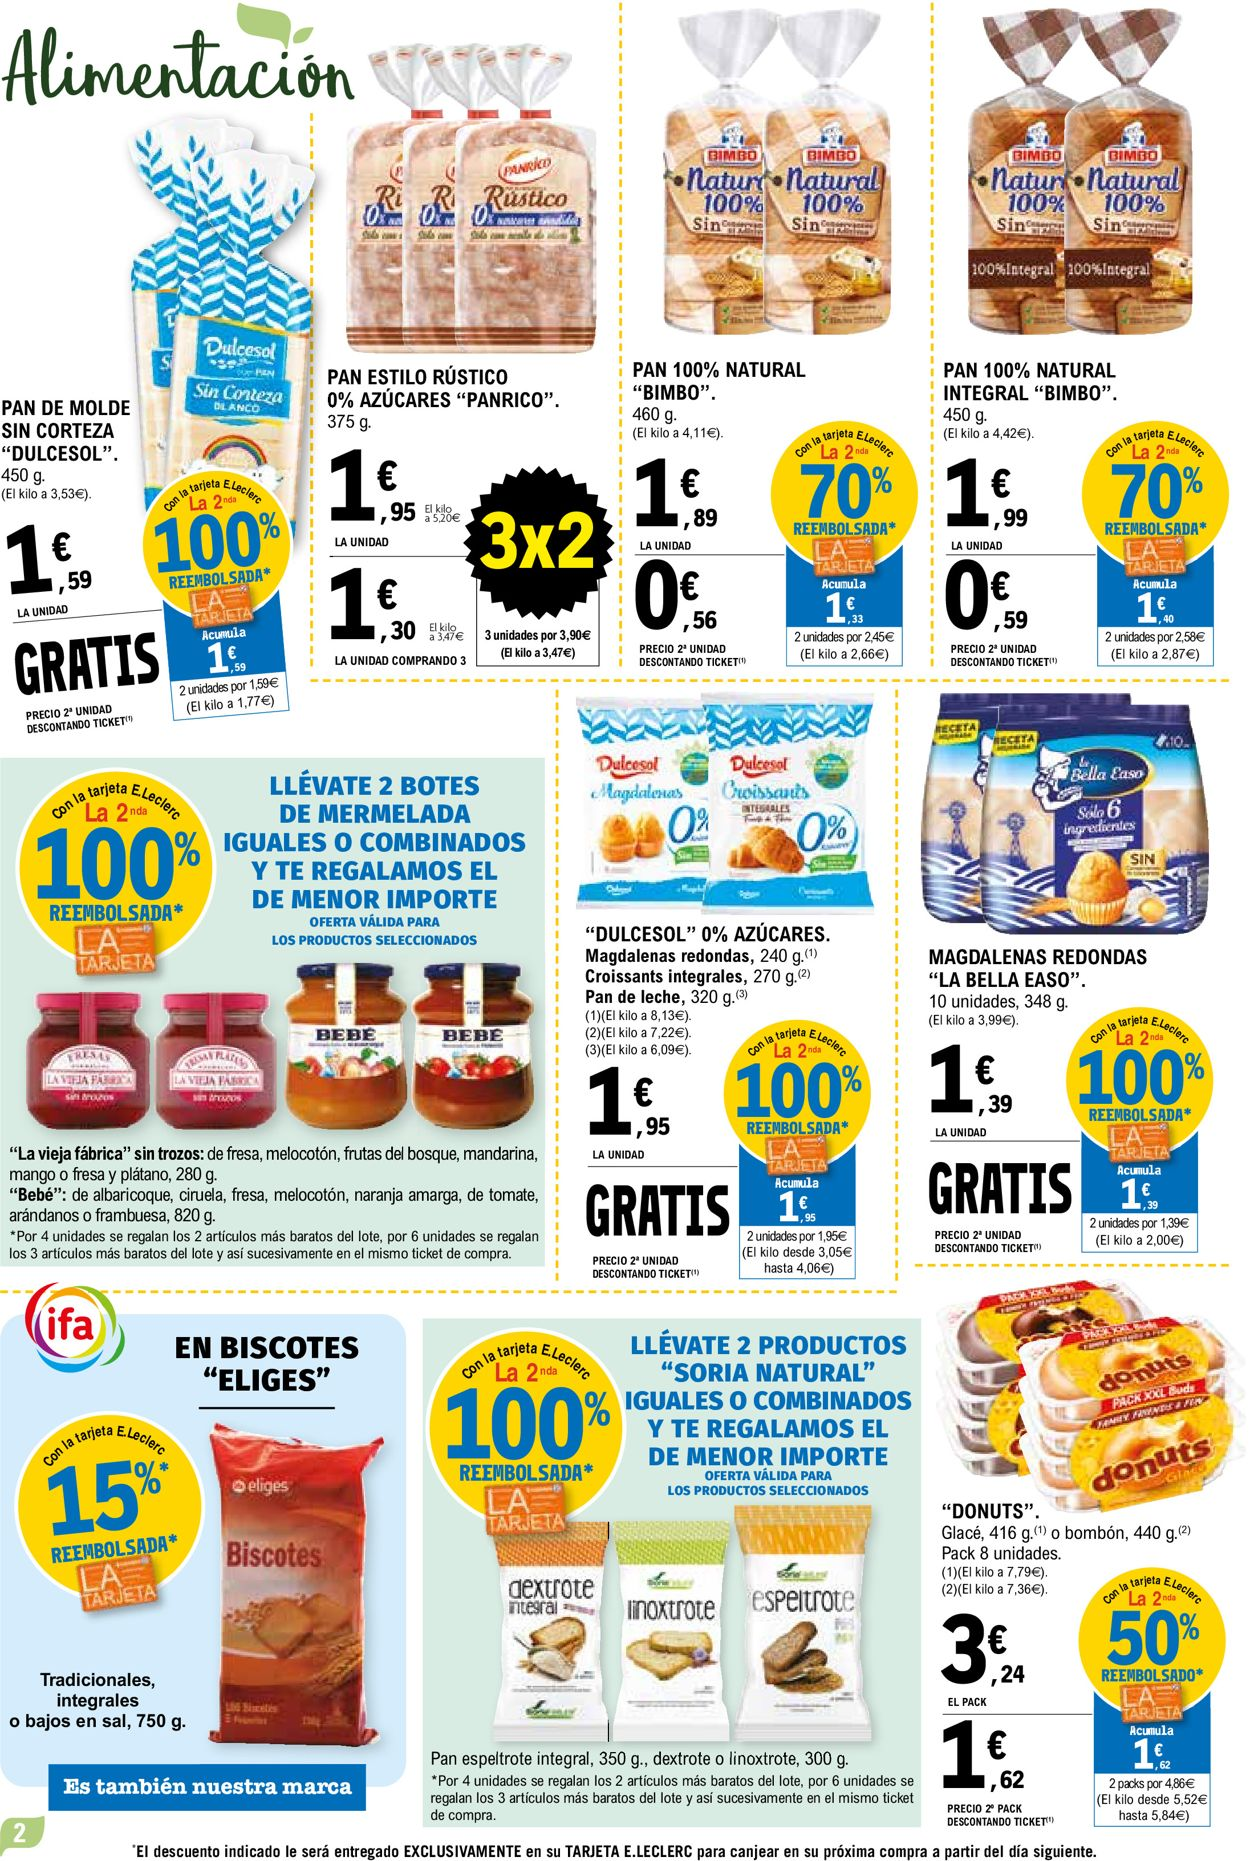 E.leclerc Folleto - 28.04-09.05.2021 (Página 2)